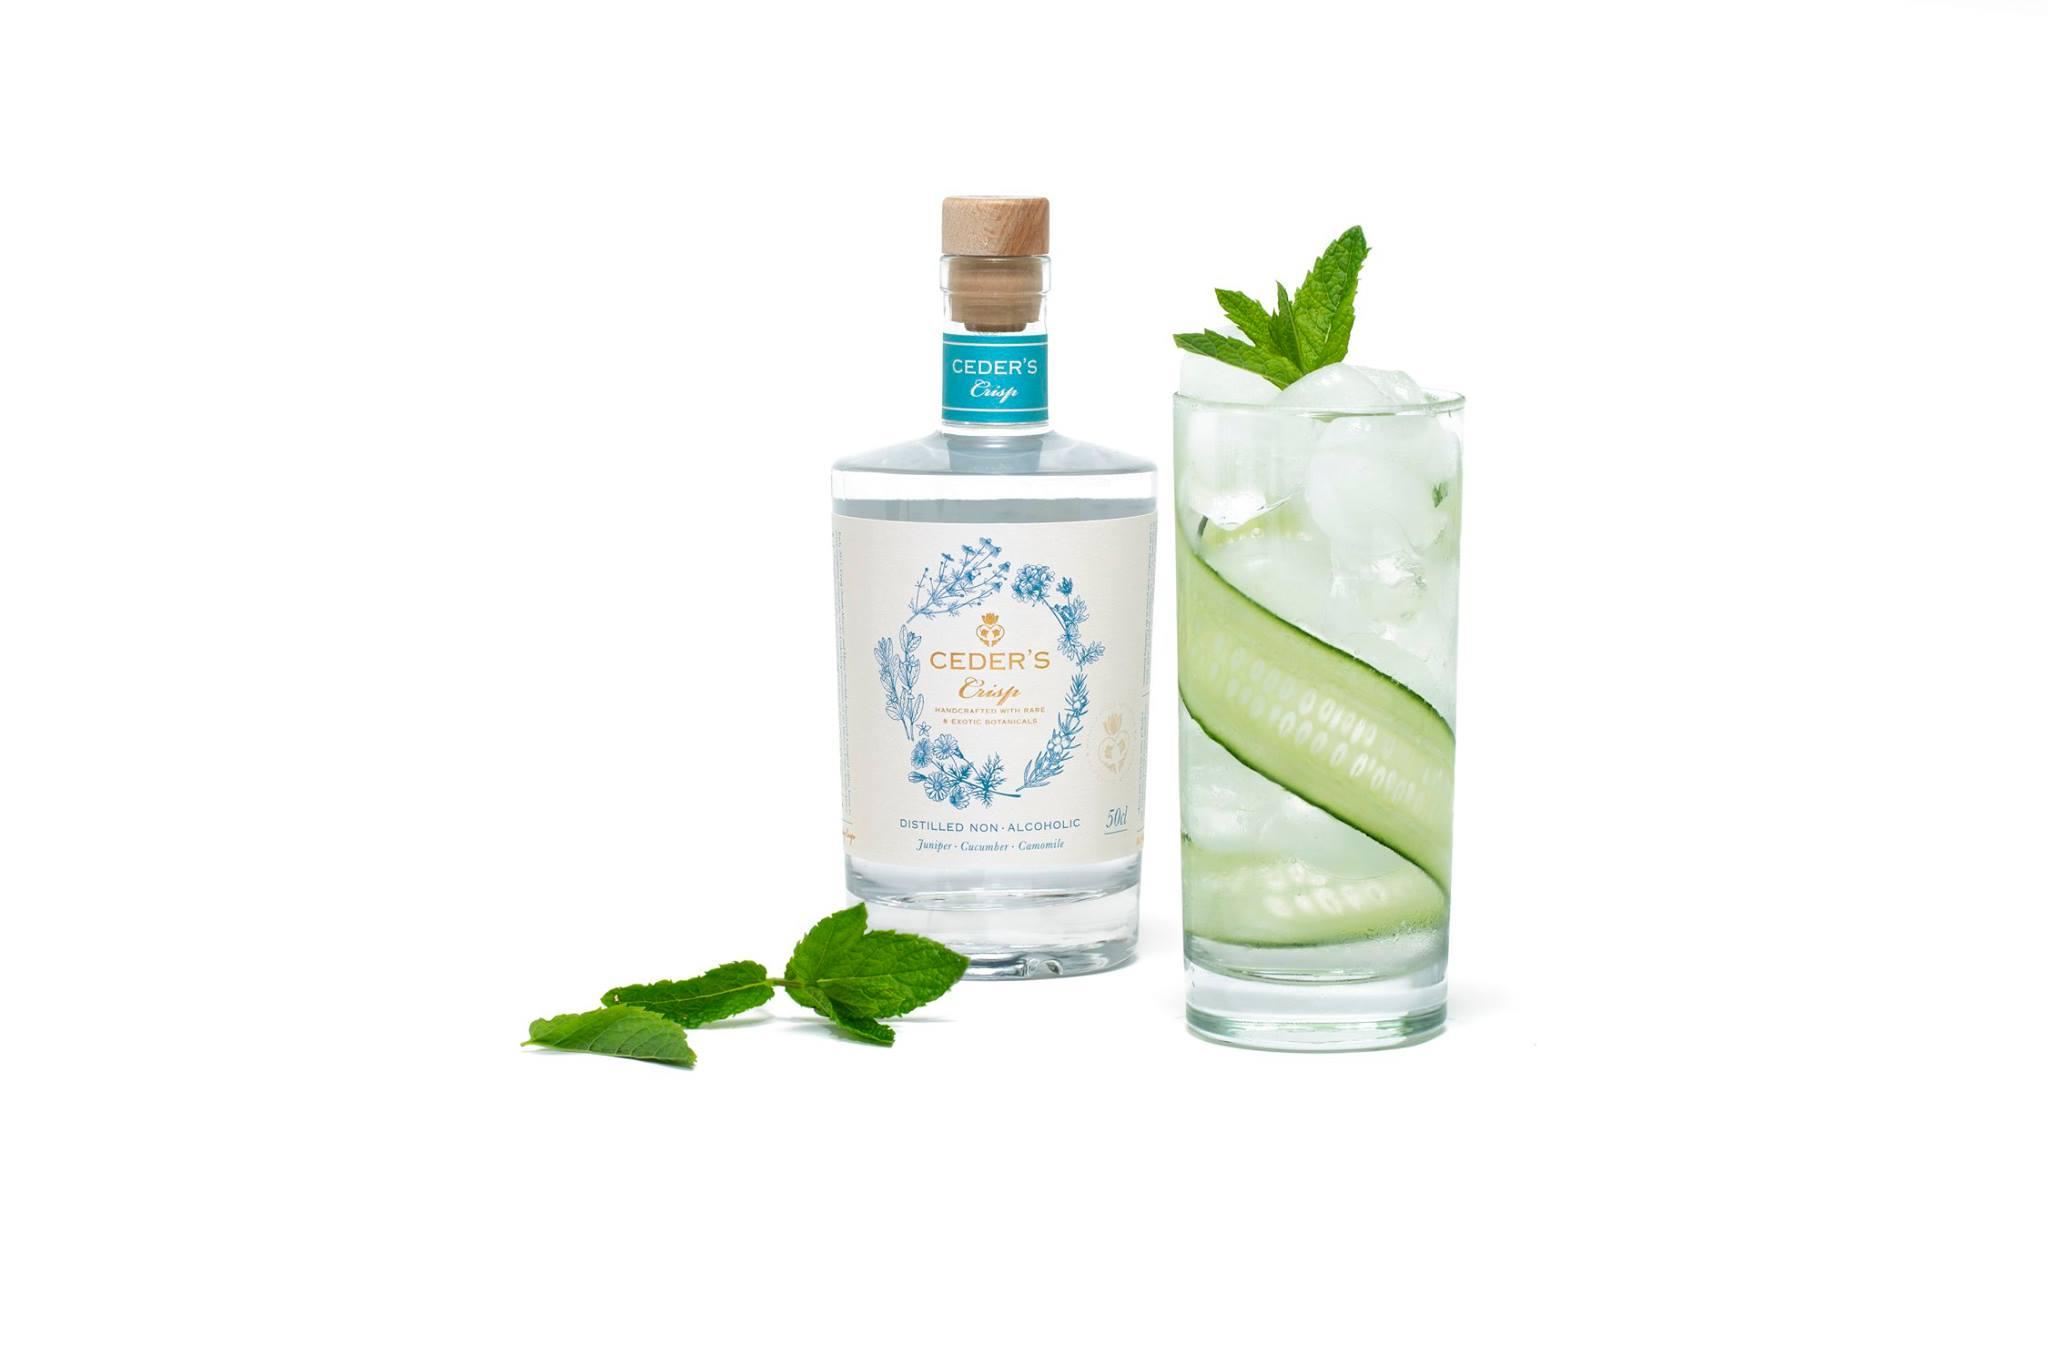 Gin sans alcool Ceder's - Pernod Ricard